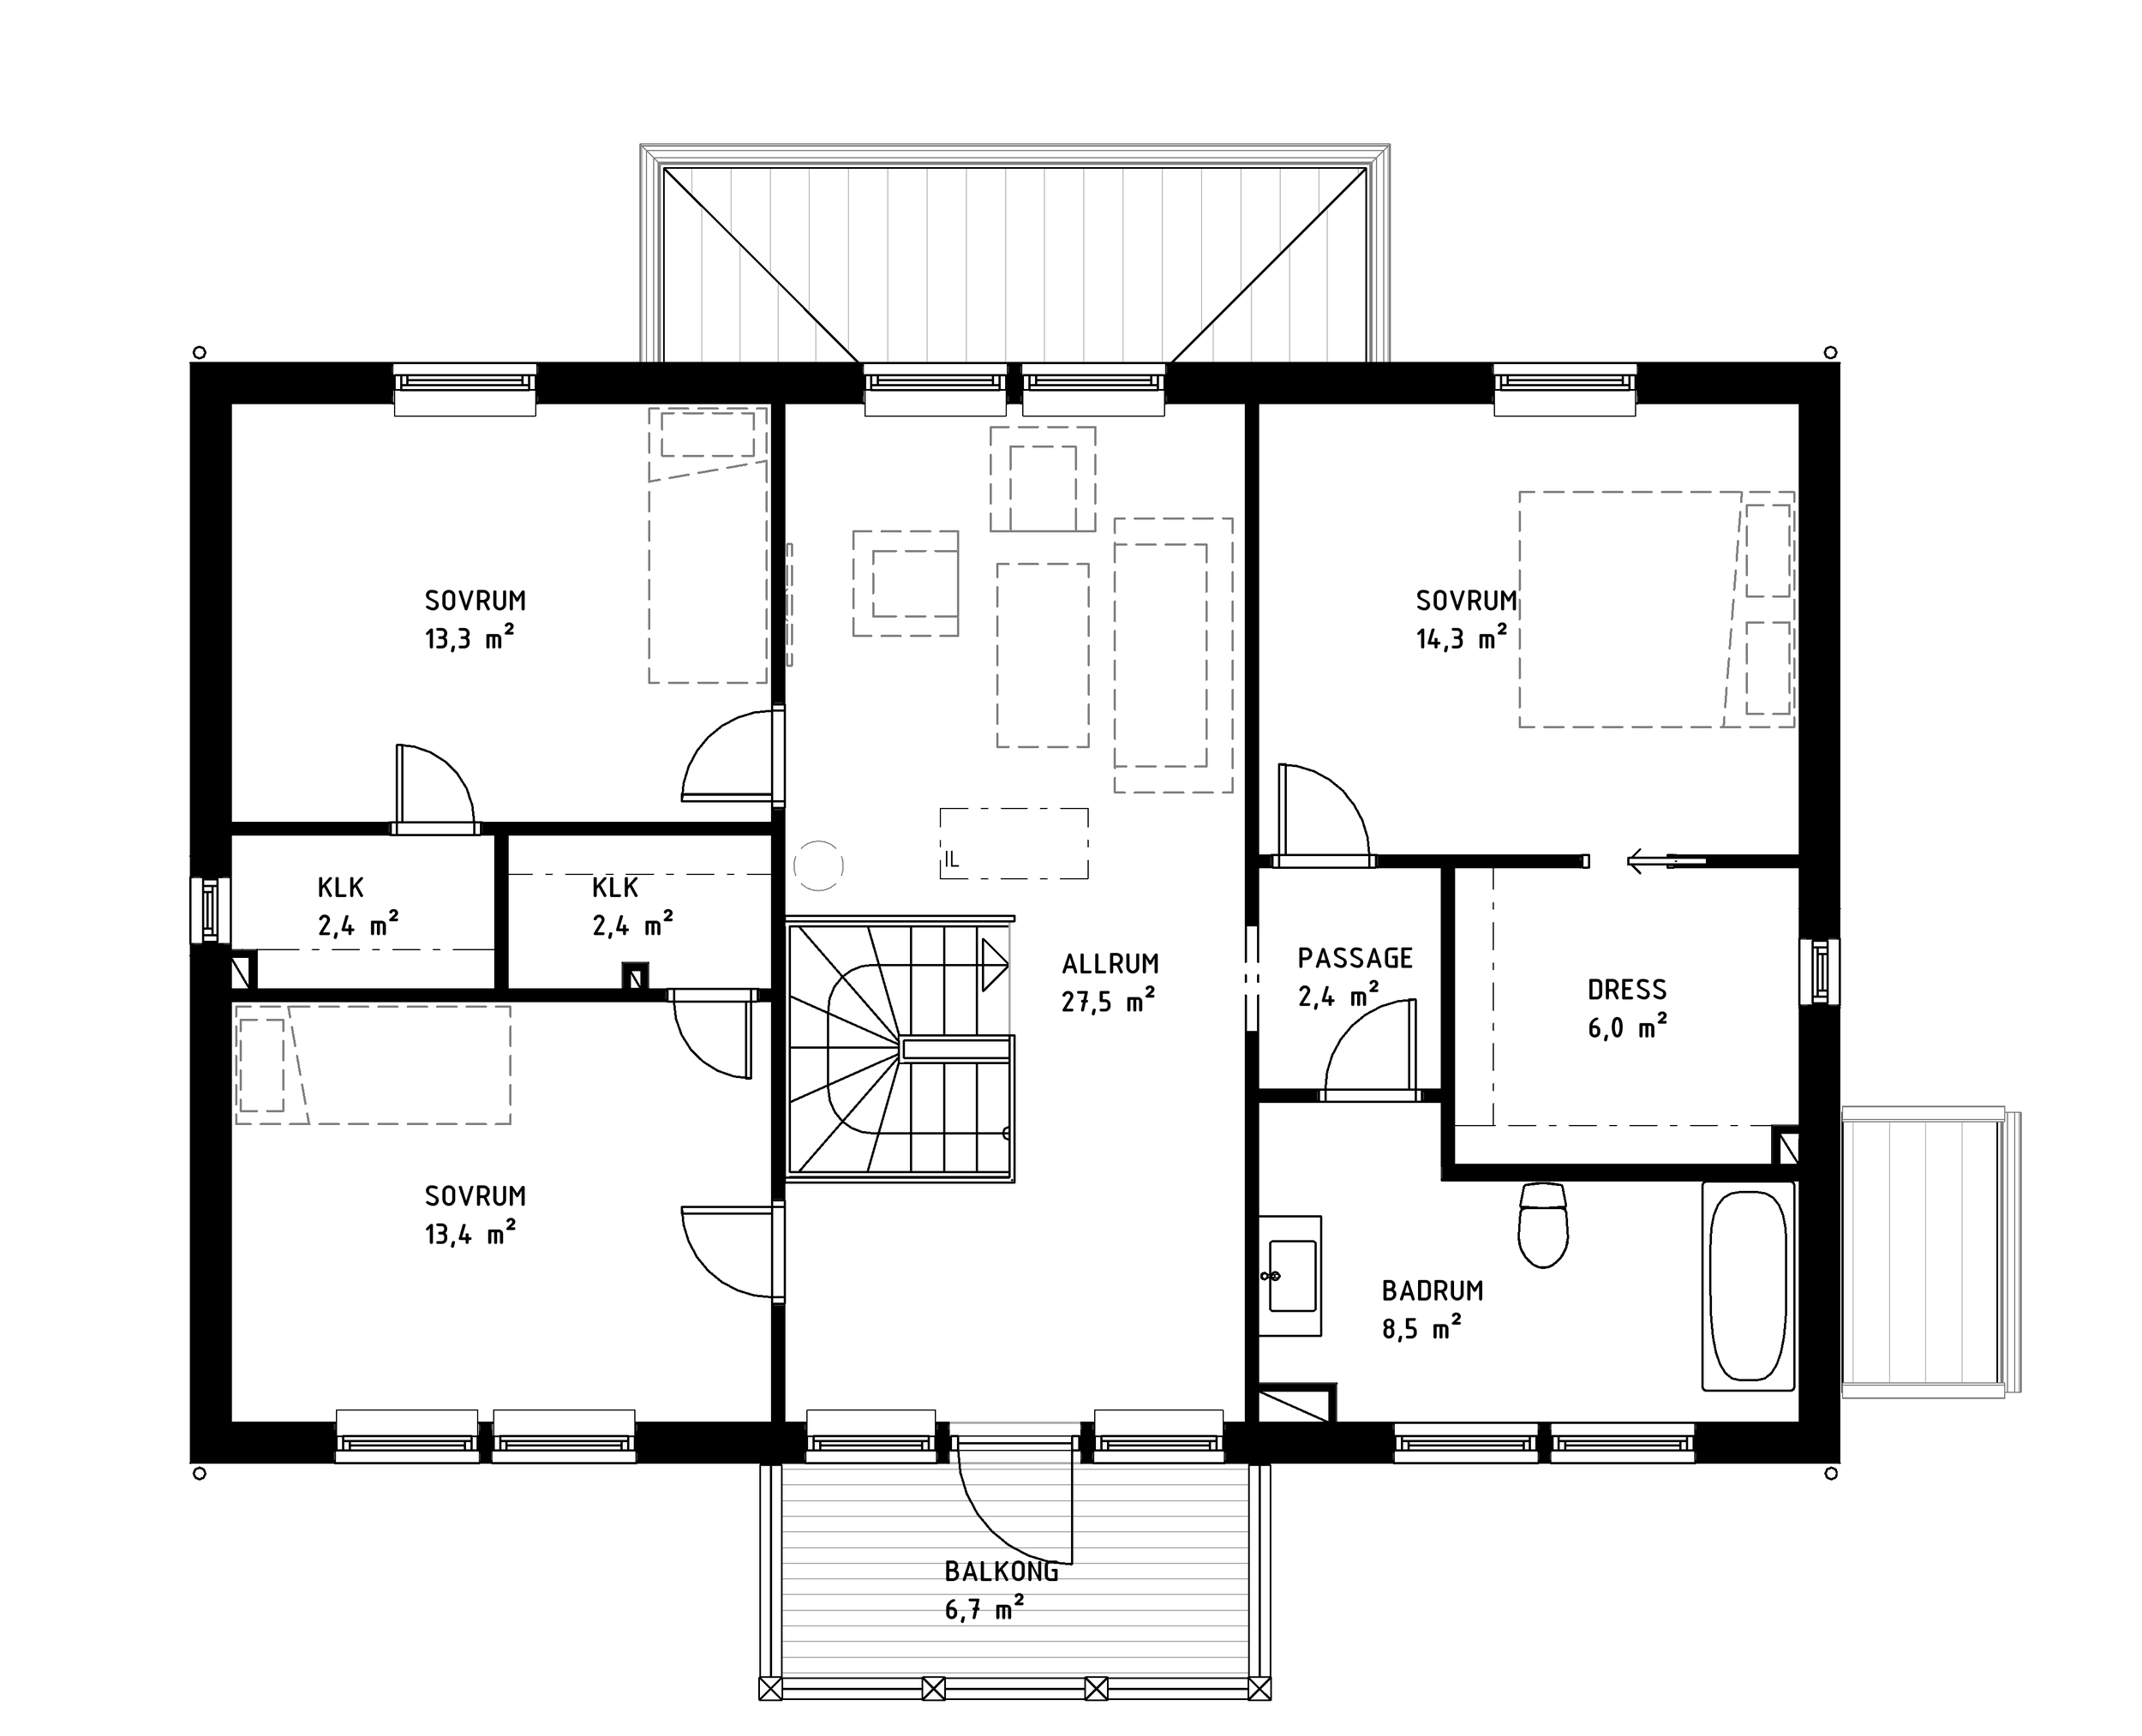 5.1.312 Solsidan plan 190820-overvaning.png